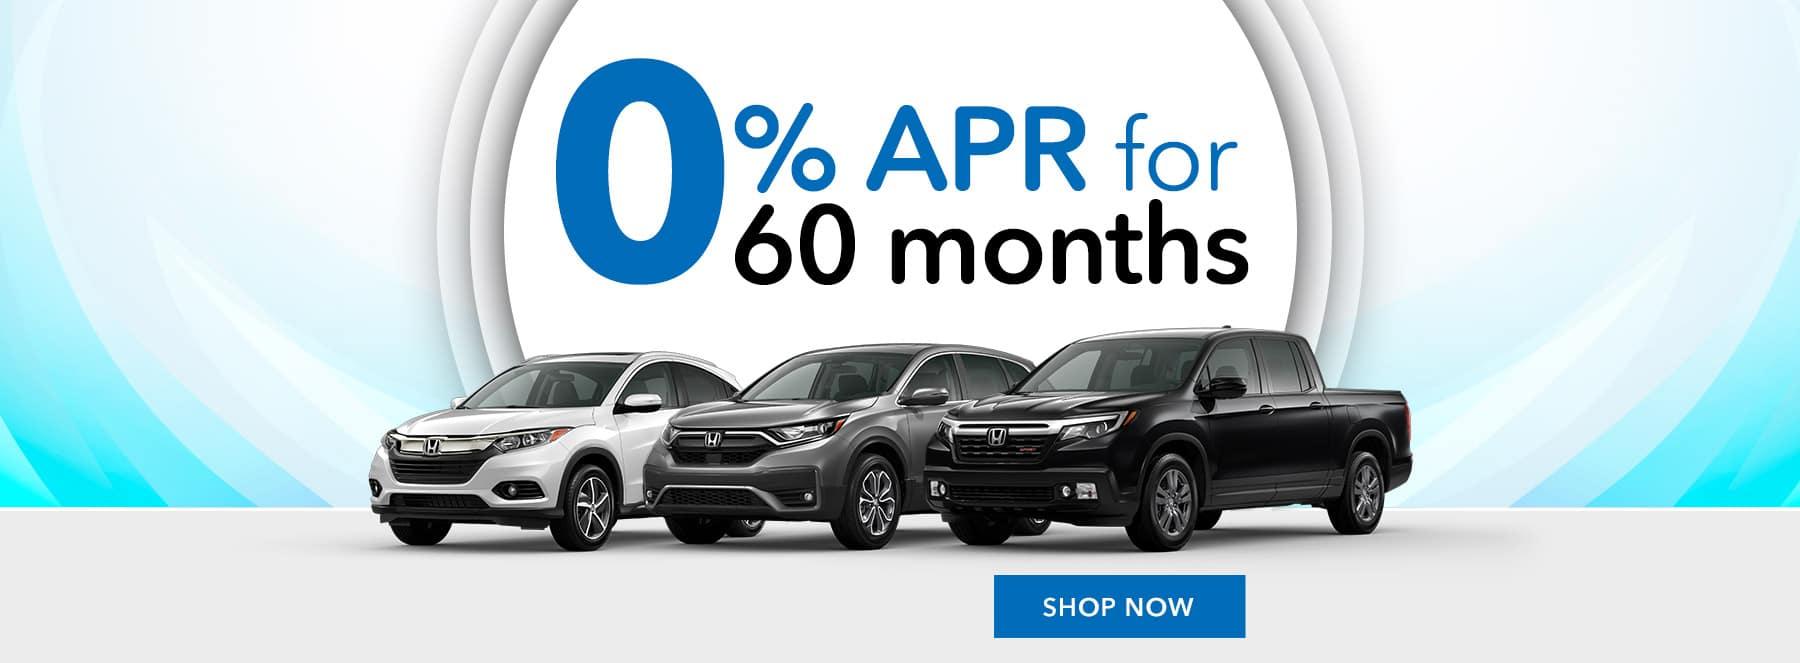 Honda 0% APR for 60 months